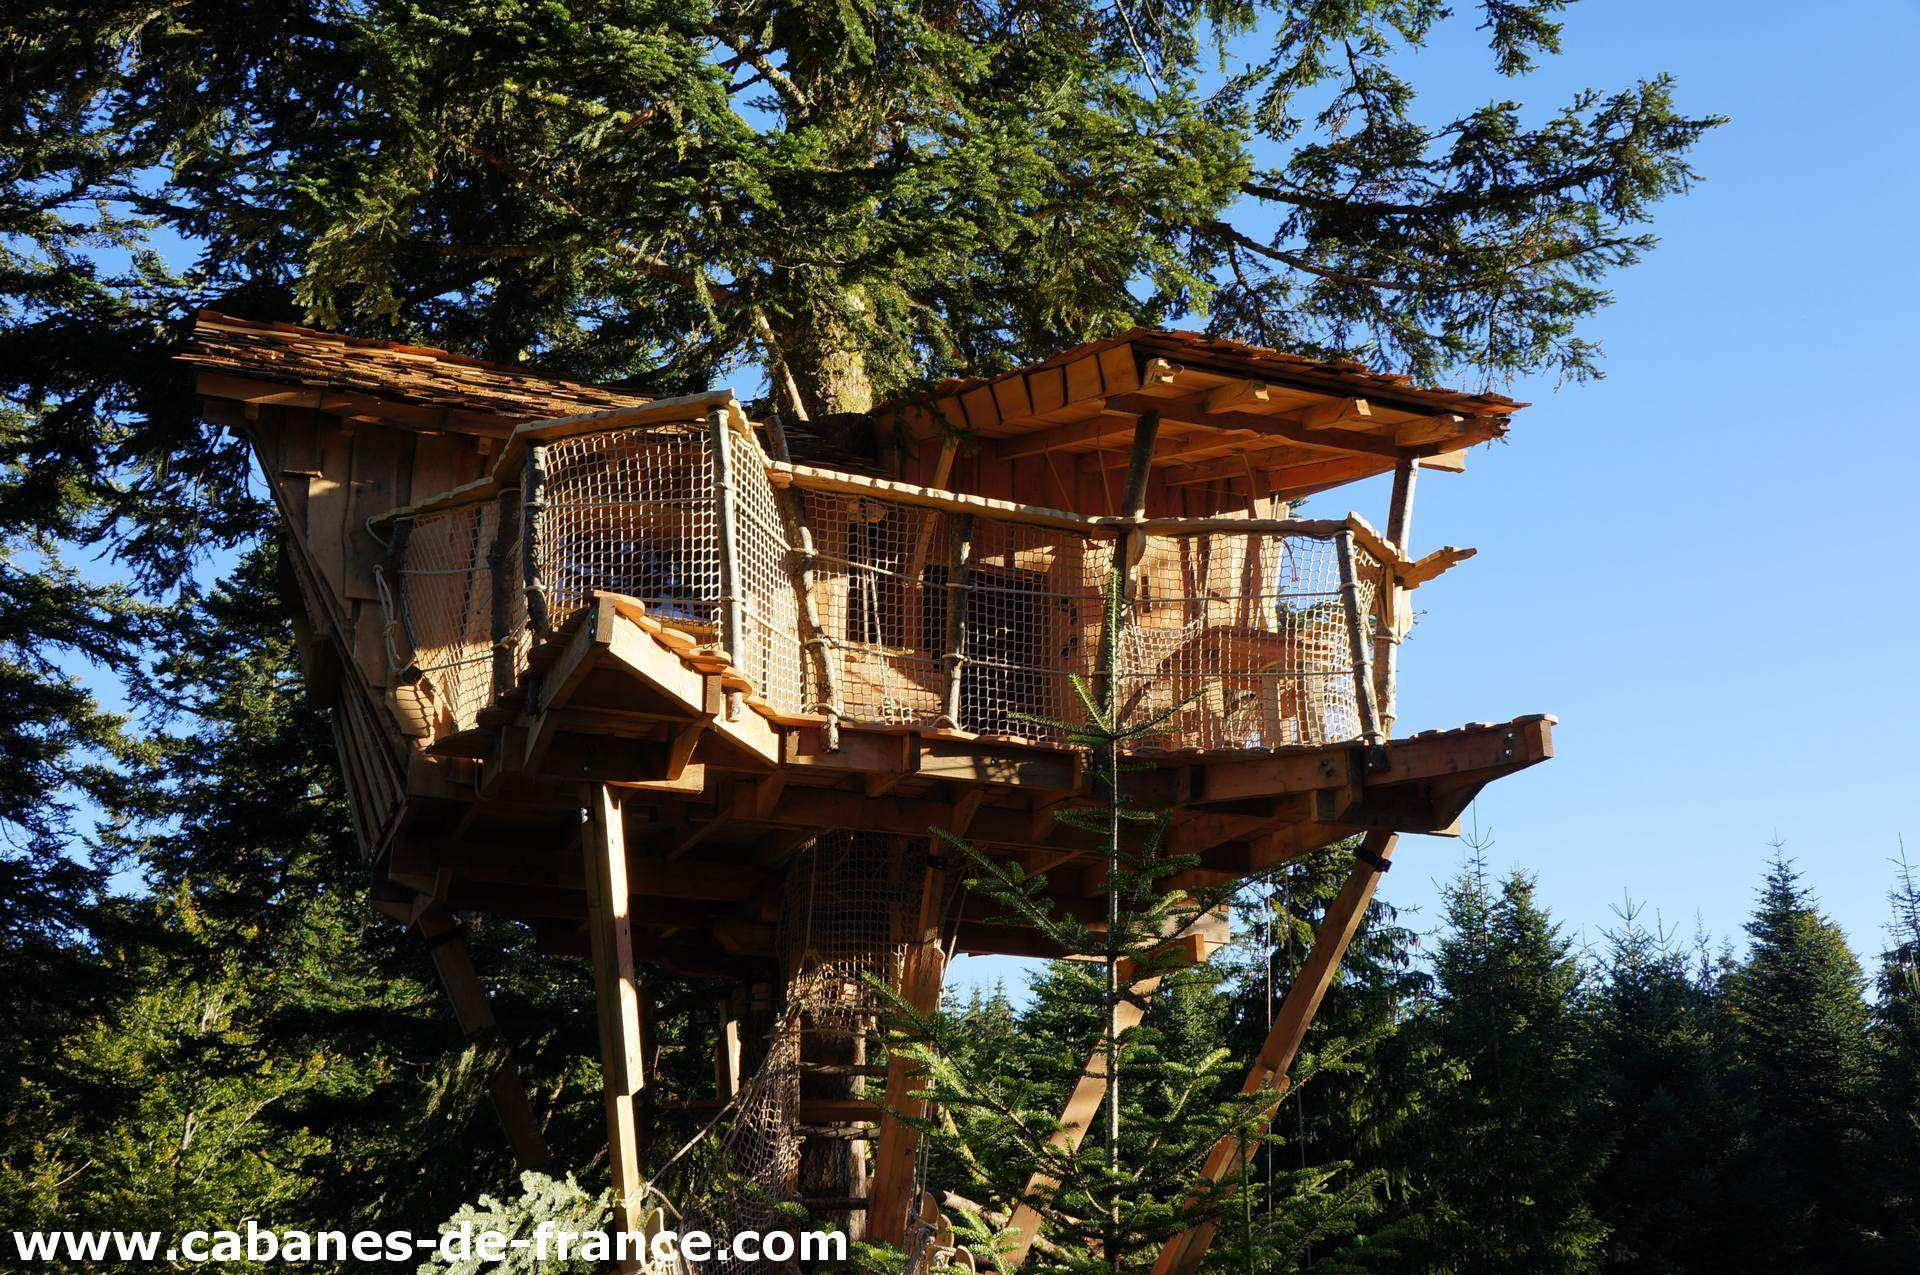 cabane nis de bisou les cabanes des volcans cabane dans les arbres en auvergne cabanes de. Black Bedroom Furniture Sets. Home Design Ideas